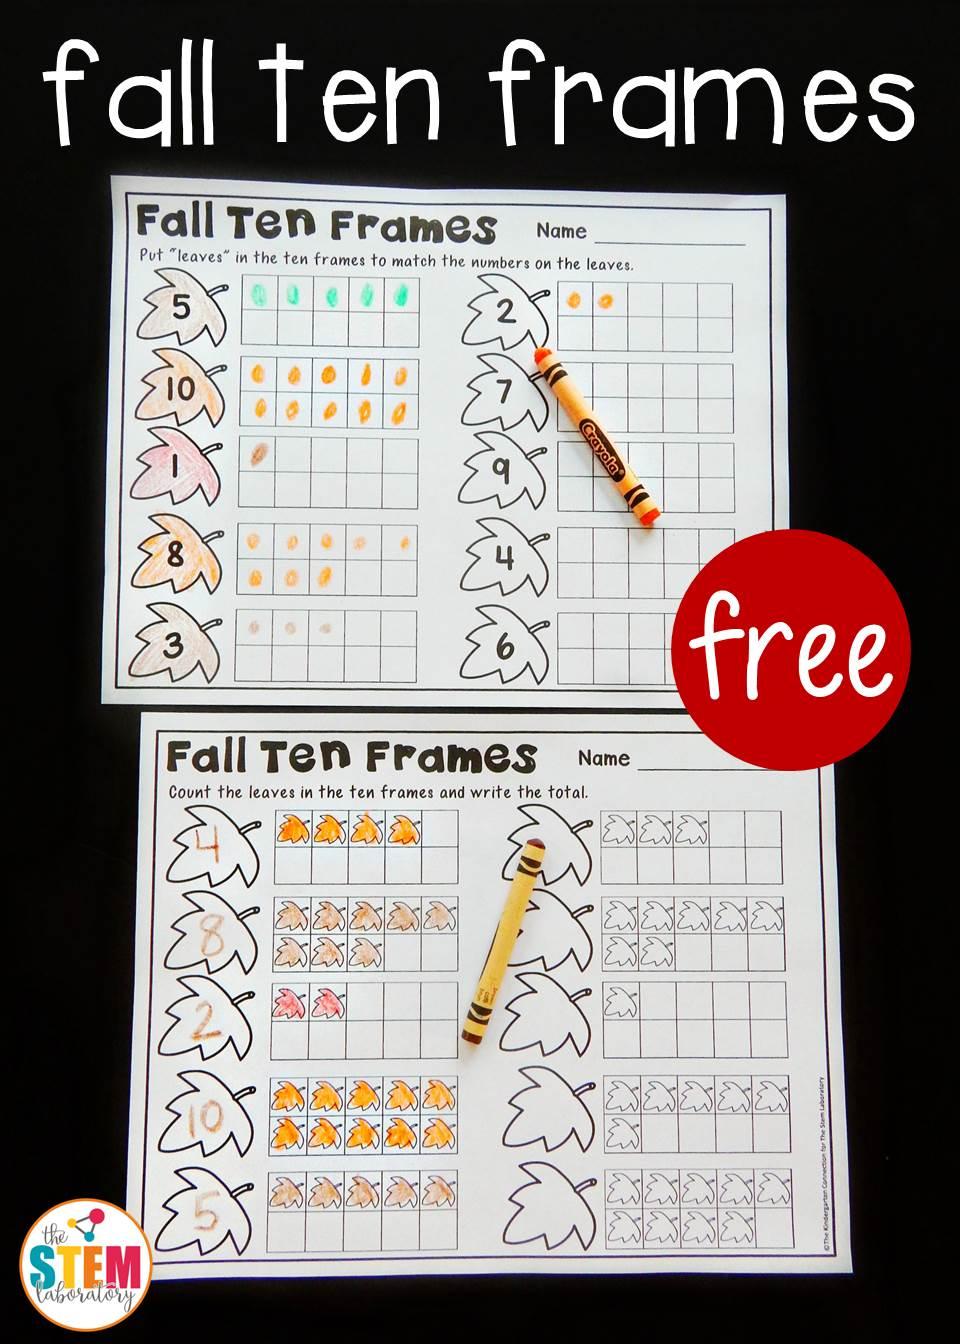 medium resolution of Fall Ten Frame Printables - The Stem Laboratory